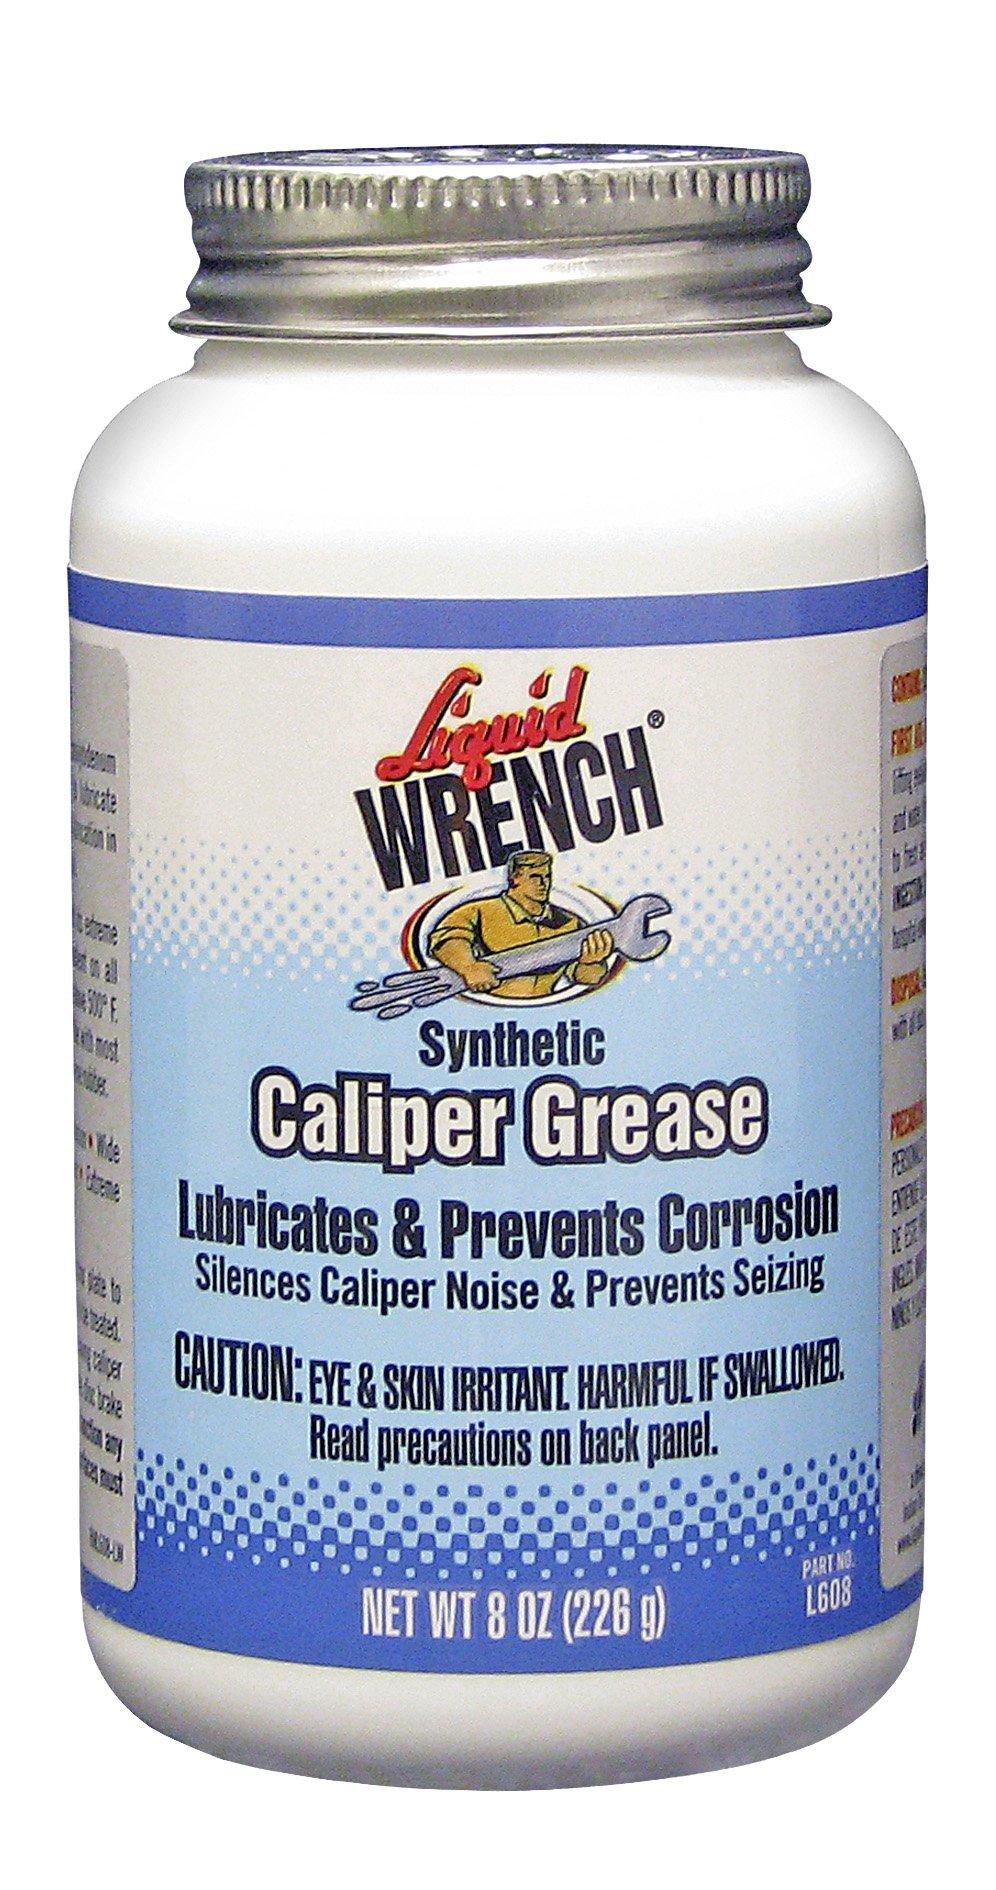 Liquid Wrench L608/6 Disc Brake Caliper Grease - 8 oz. by Gunk